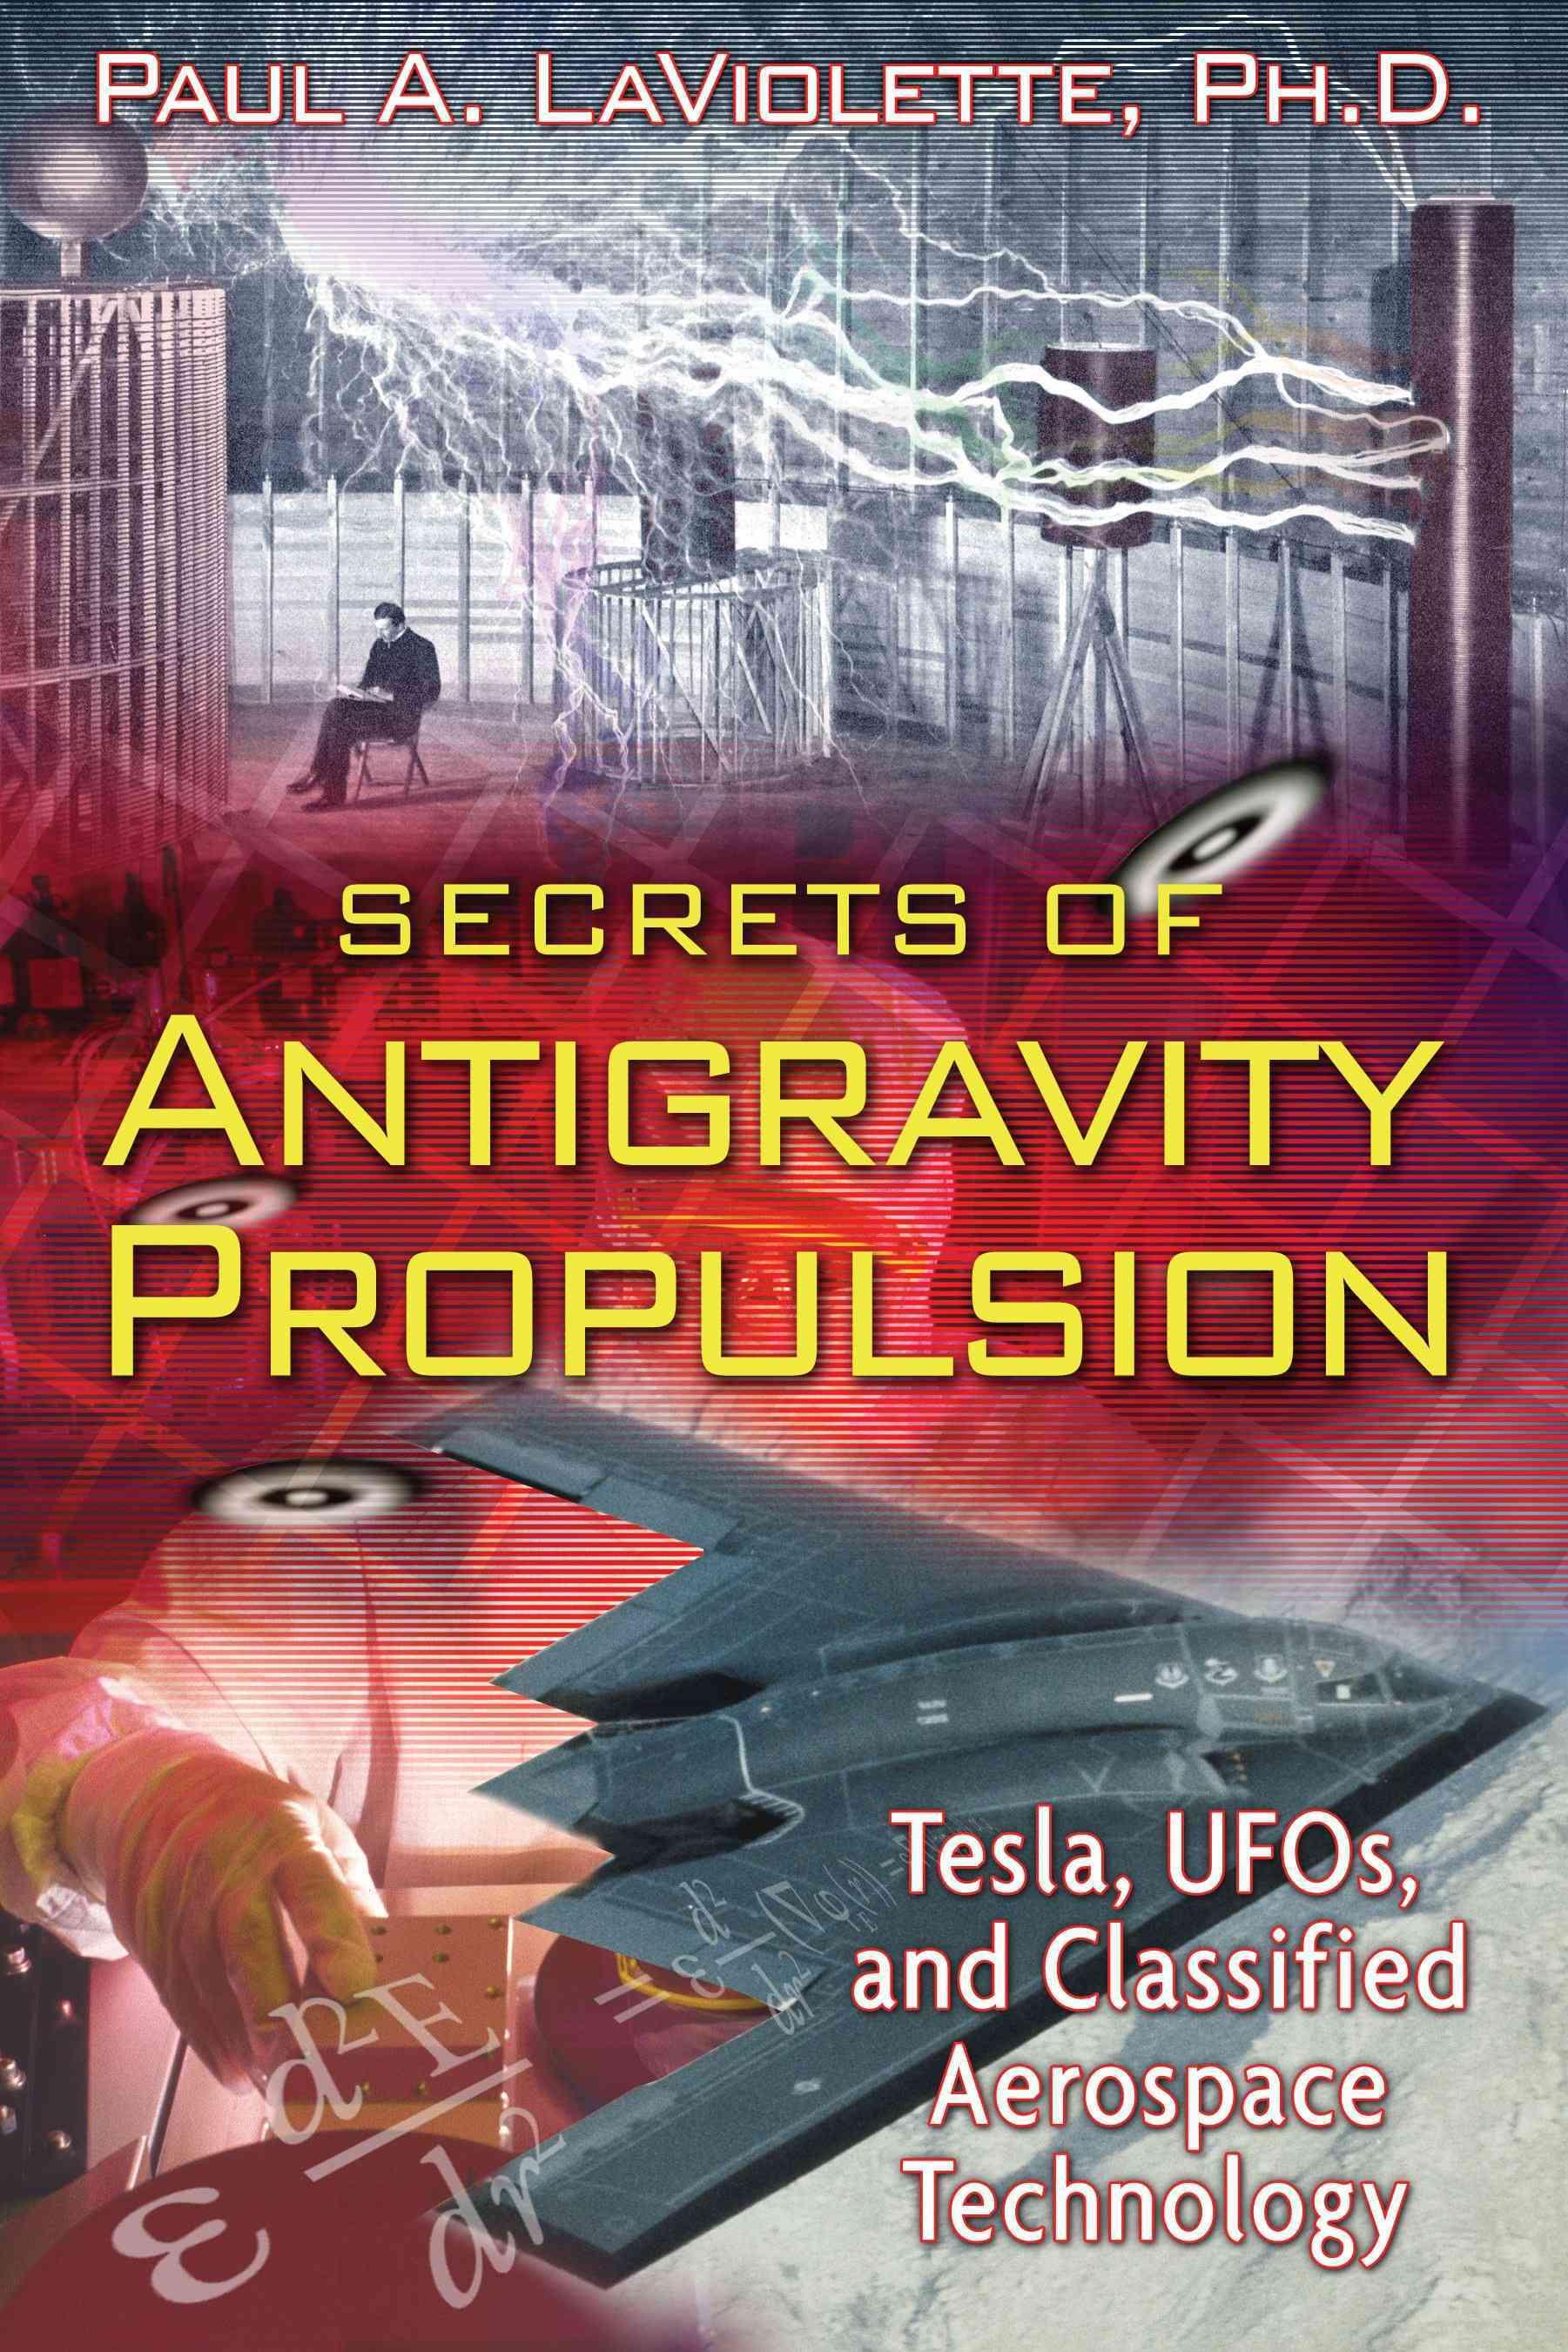 Secrets of Antigravity Propulsion: Tesla, Ufos, and Classified Aerospace Technology (Paperback)